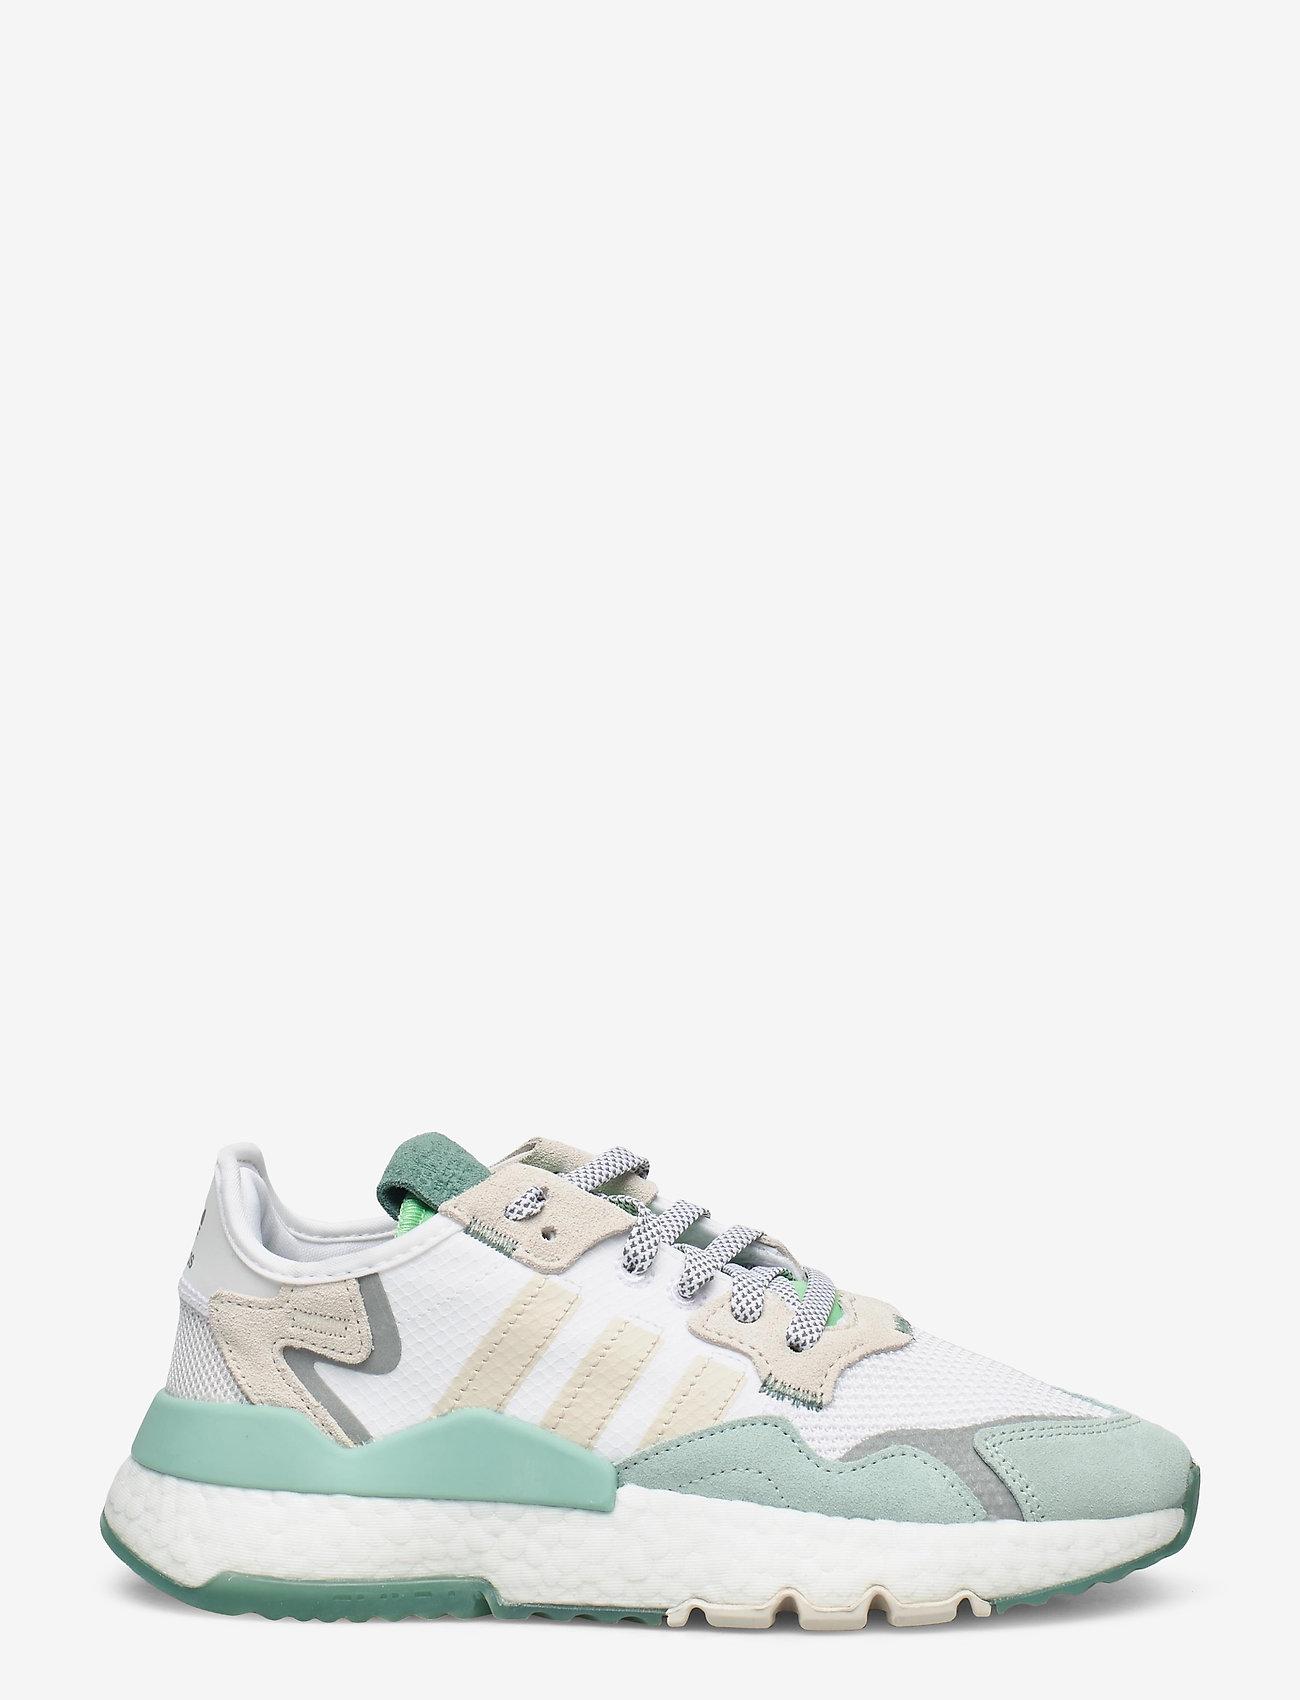 adidas Originals - NITE JOGGER W - chunky sneaker - ftwwht/alumin/alumin - 1